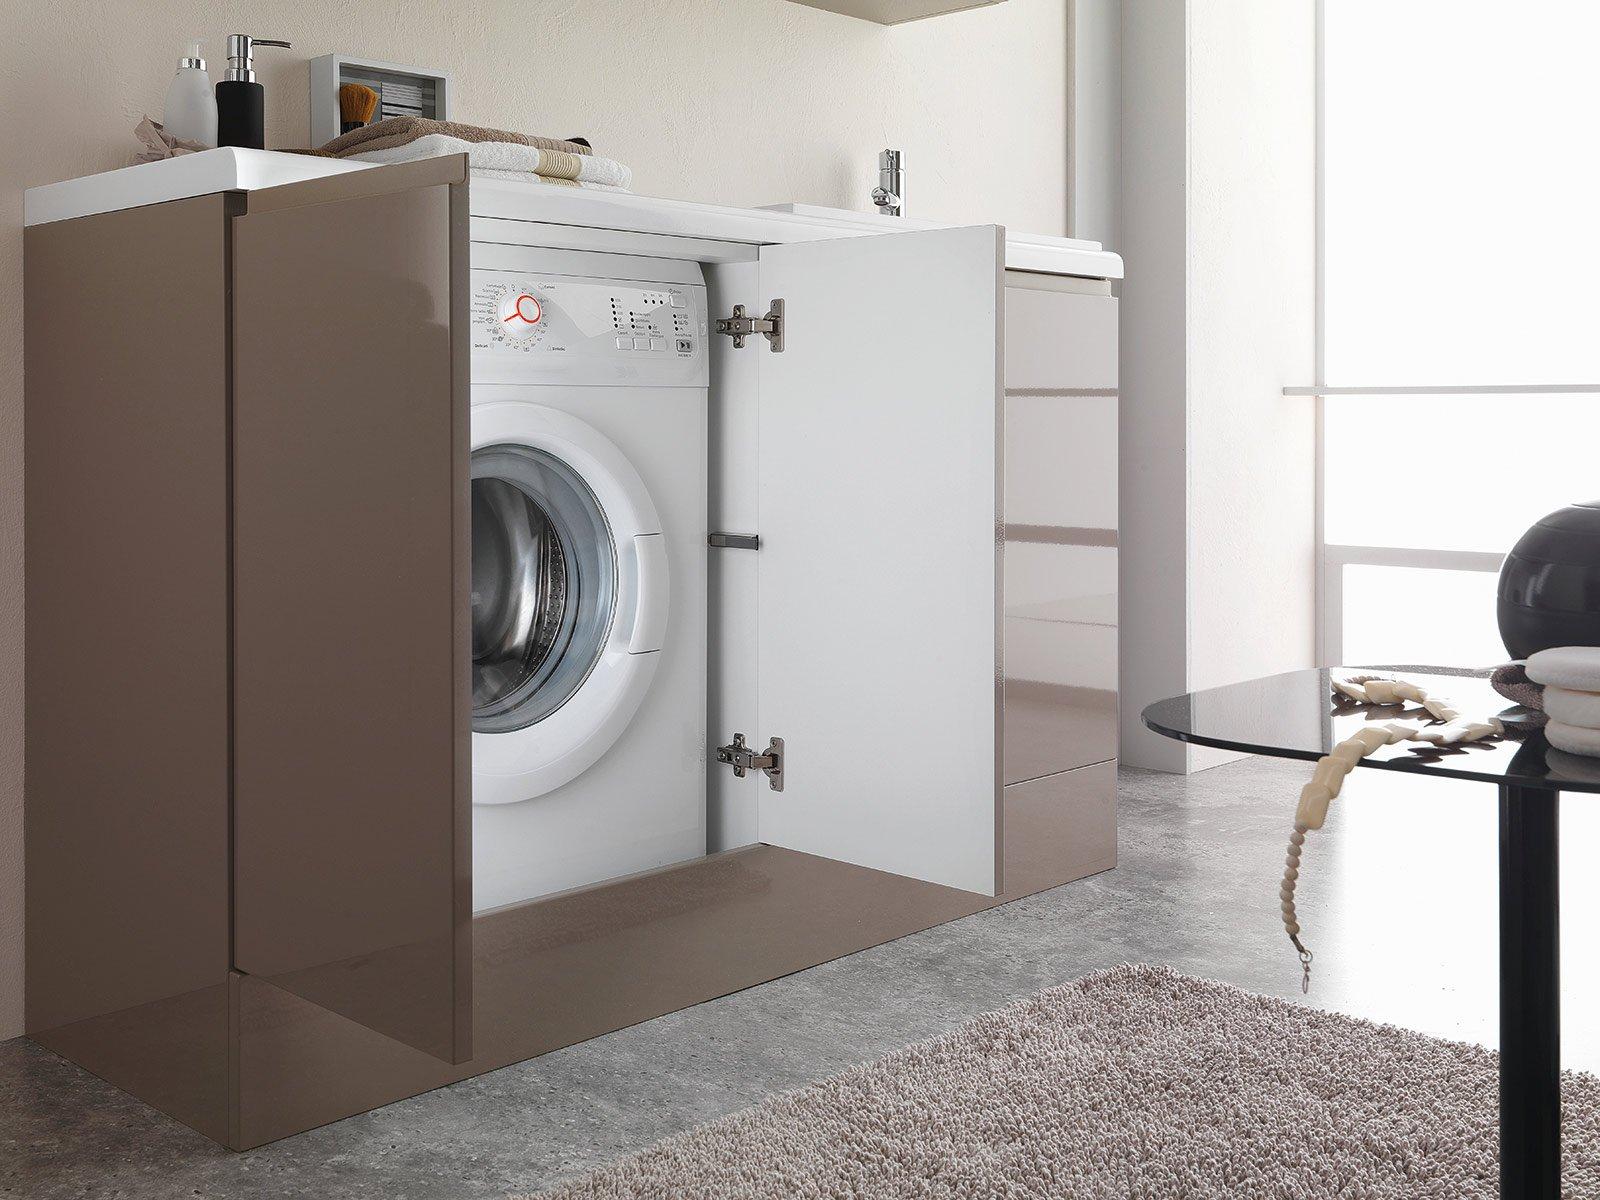 Coprilavatrice ikea - Mobile per lavatrice ikea ...